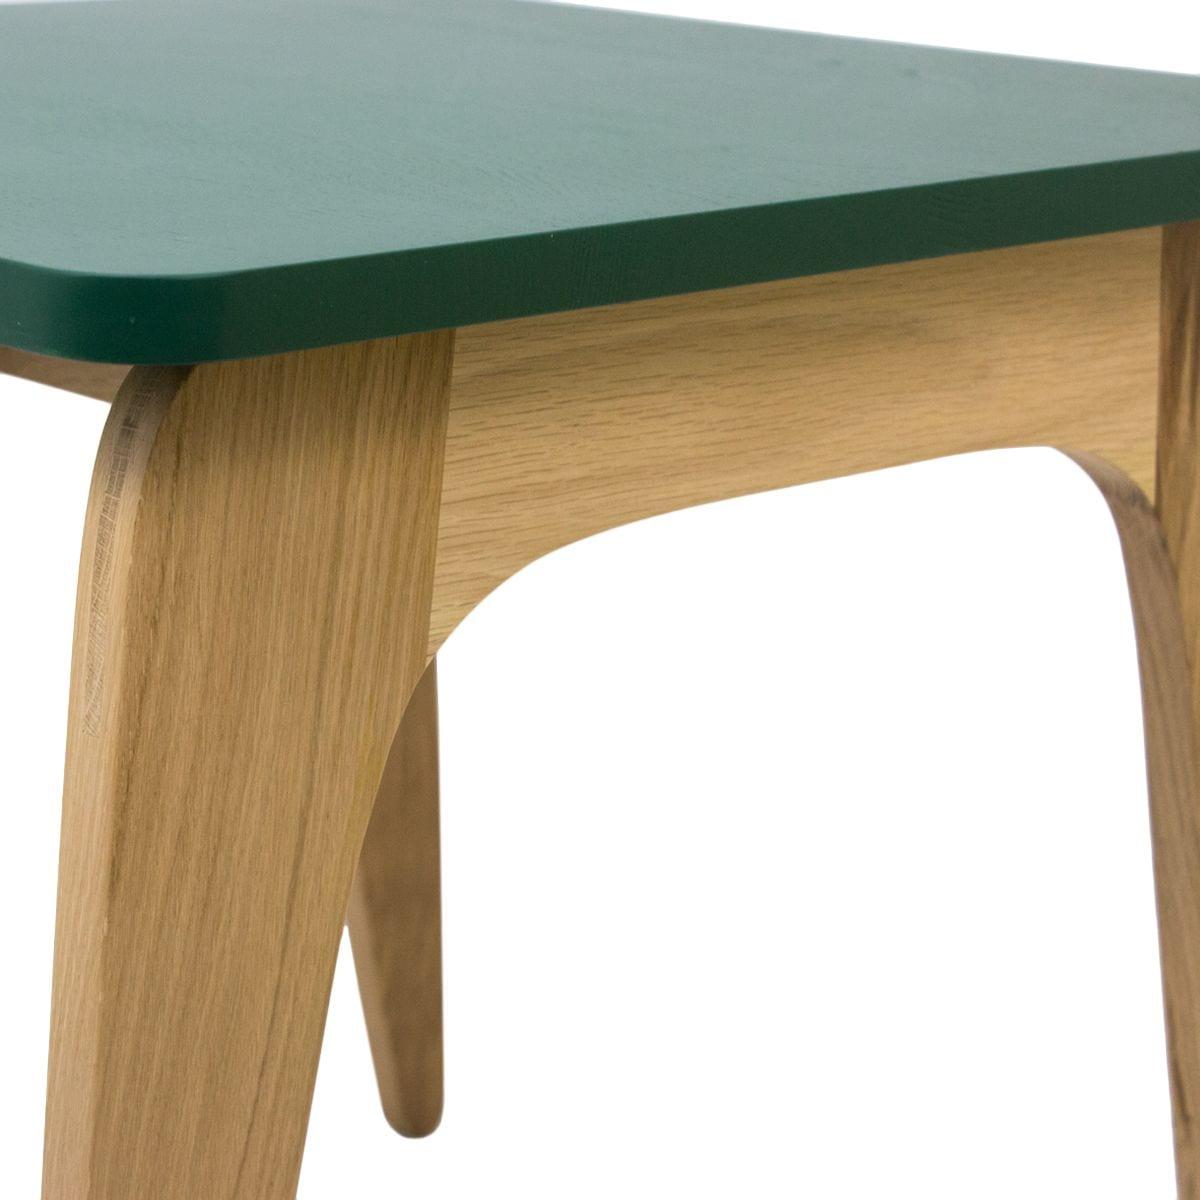 Table Enfant Et Bébé Made In France, Mobilier Durable